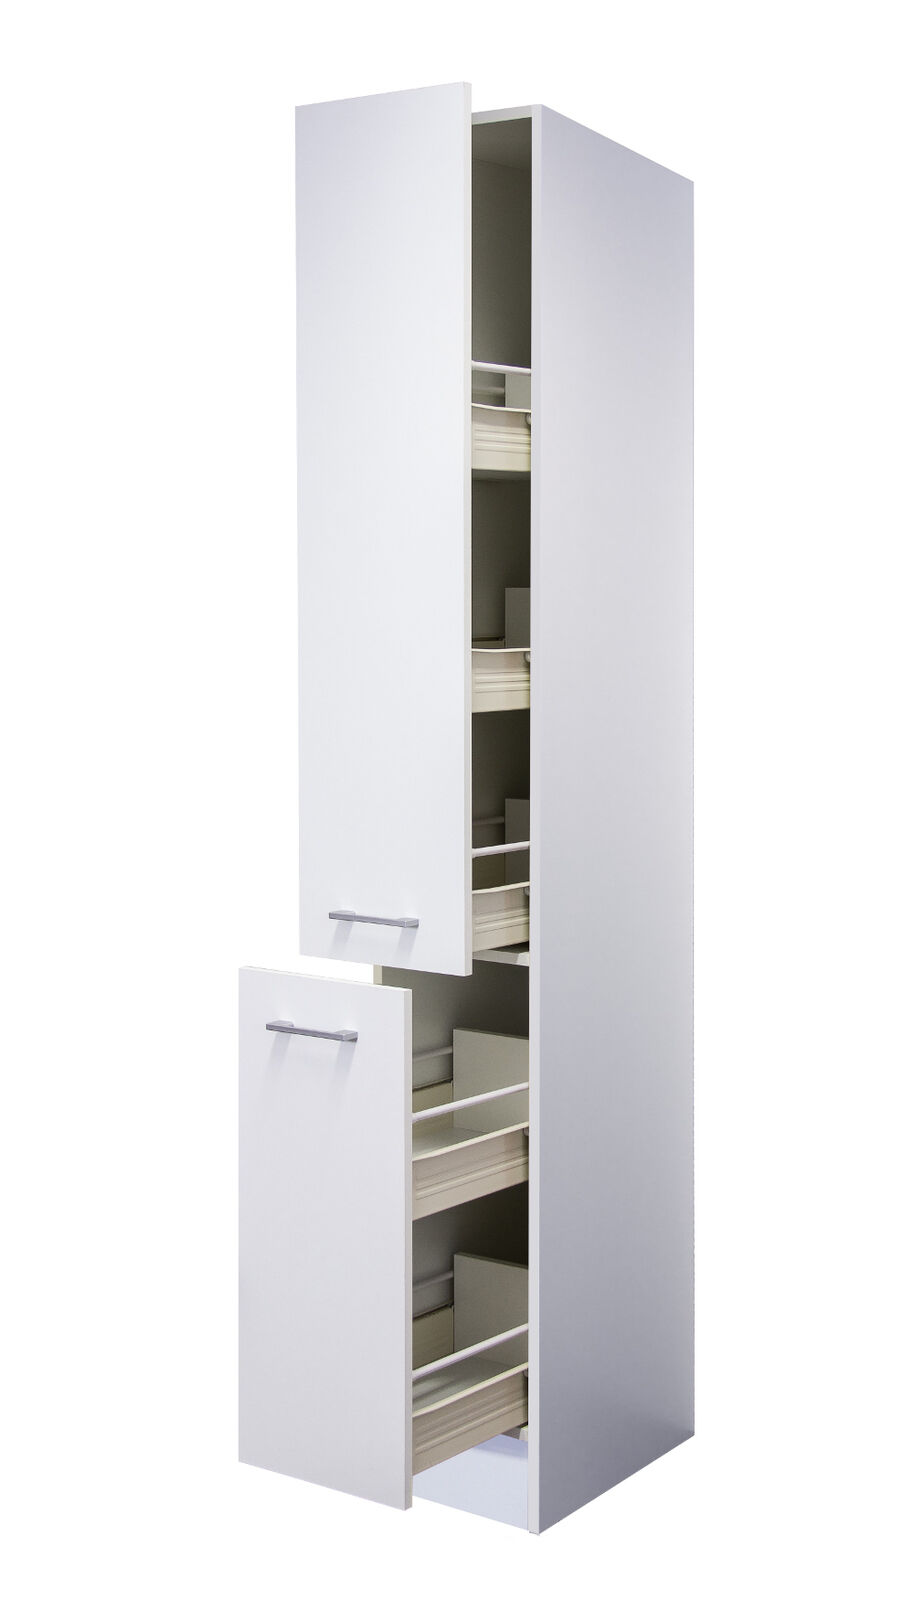 apothekerschrank k che test vergleich apothekerschrank. Black Bedroom Furniture Sets. Home Design Ideas